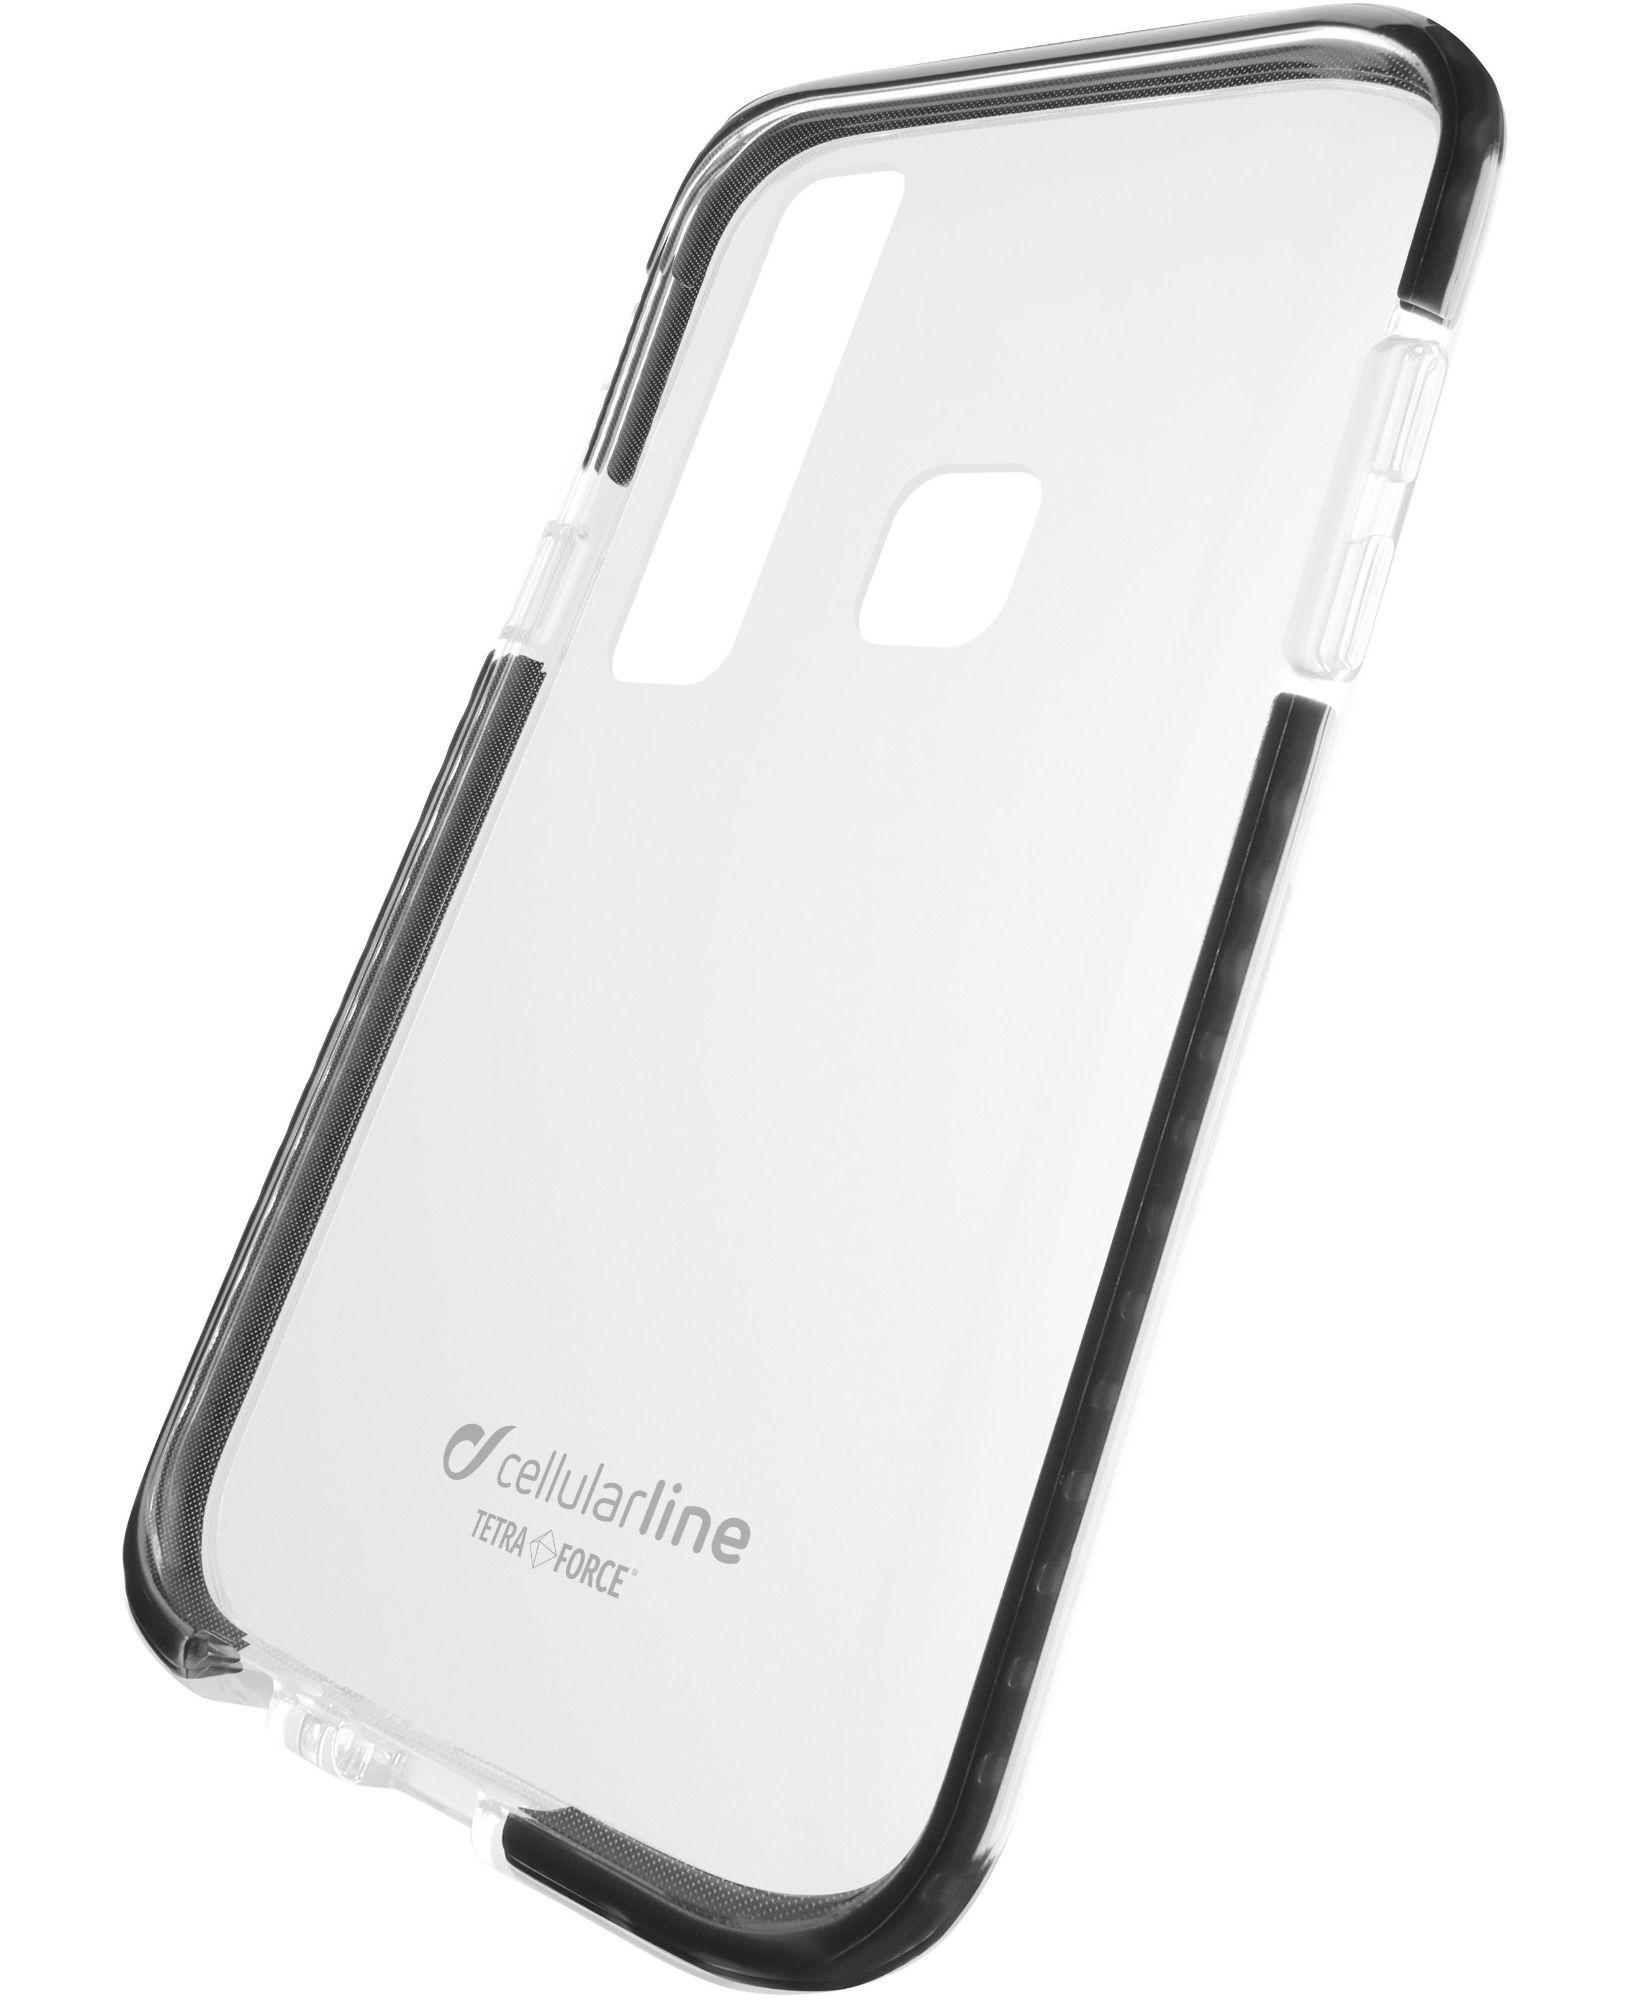 Cellular Line Custodia protettiva Samsung Galaxy A9 (2018) - Tetracgala918t